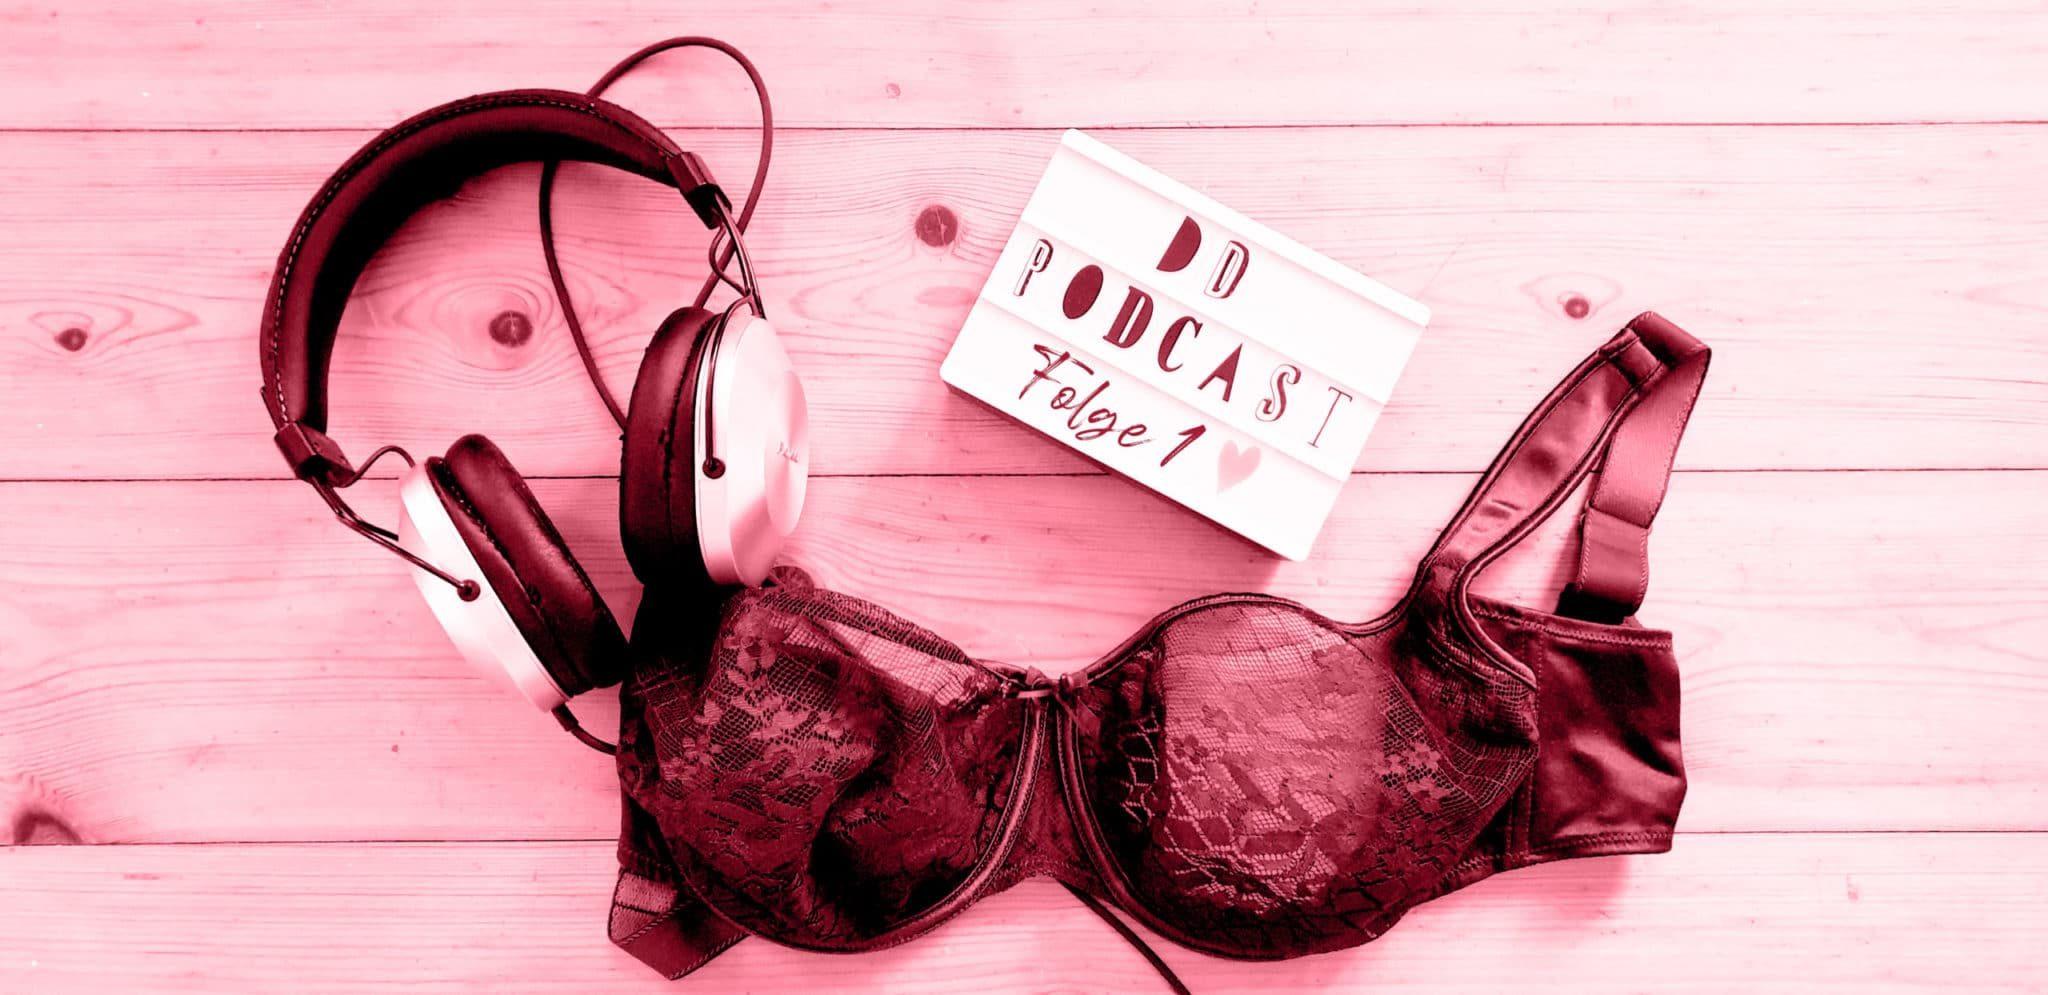 Podcastfolge 1